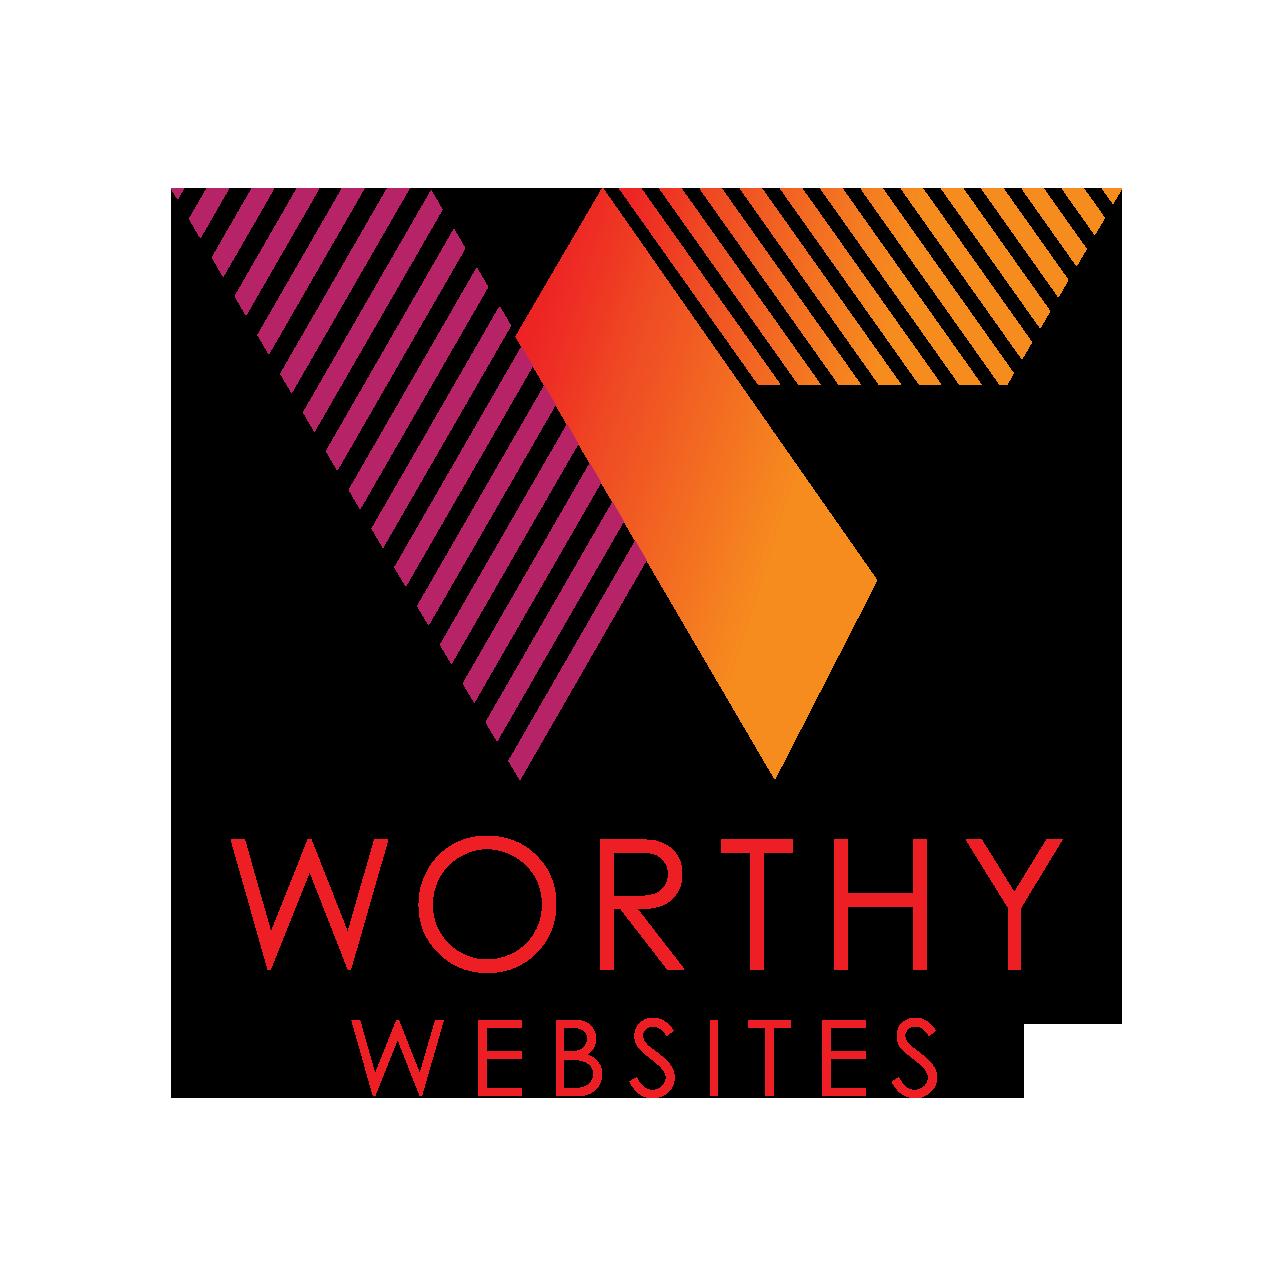 worthy website logo